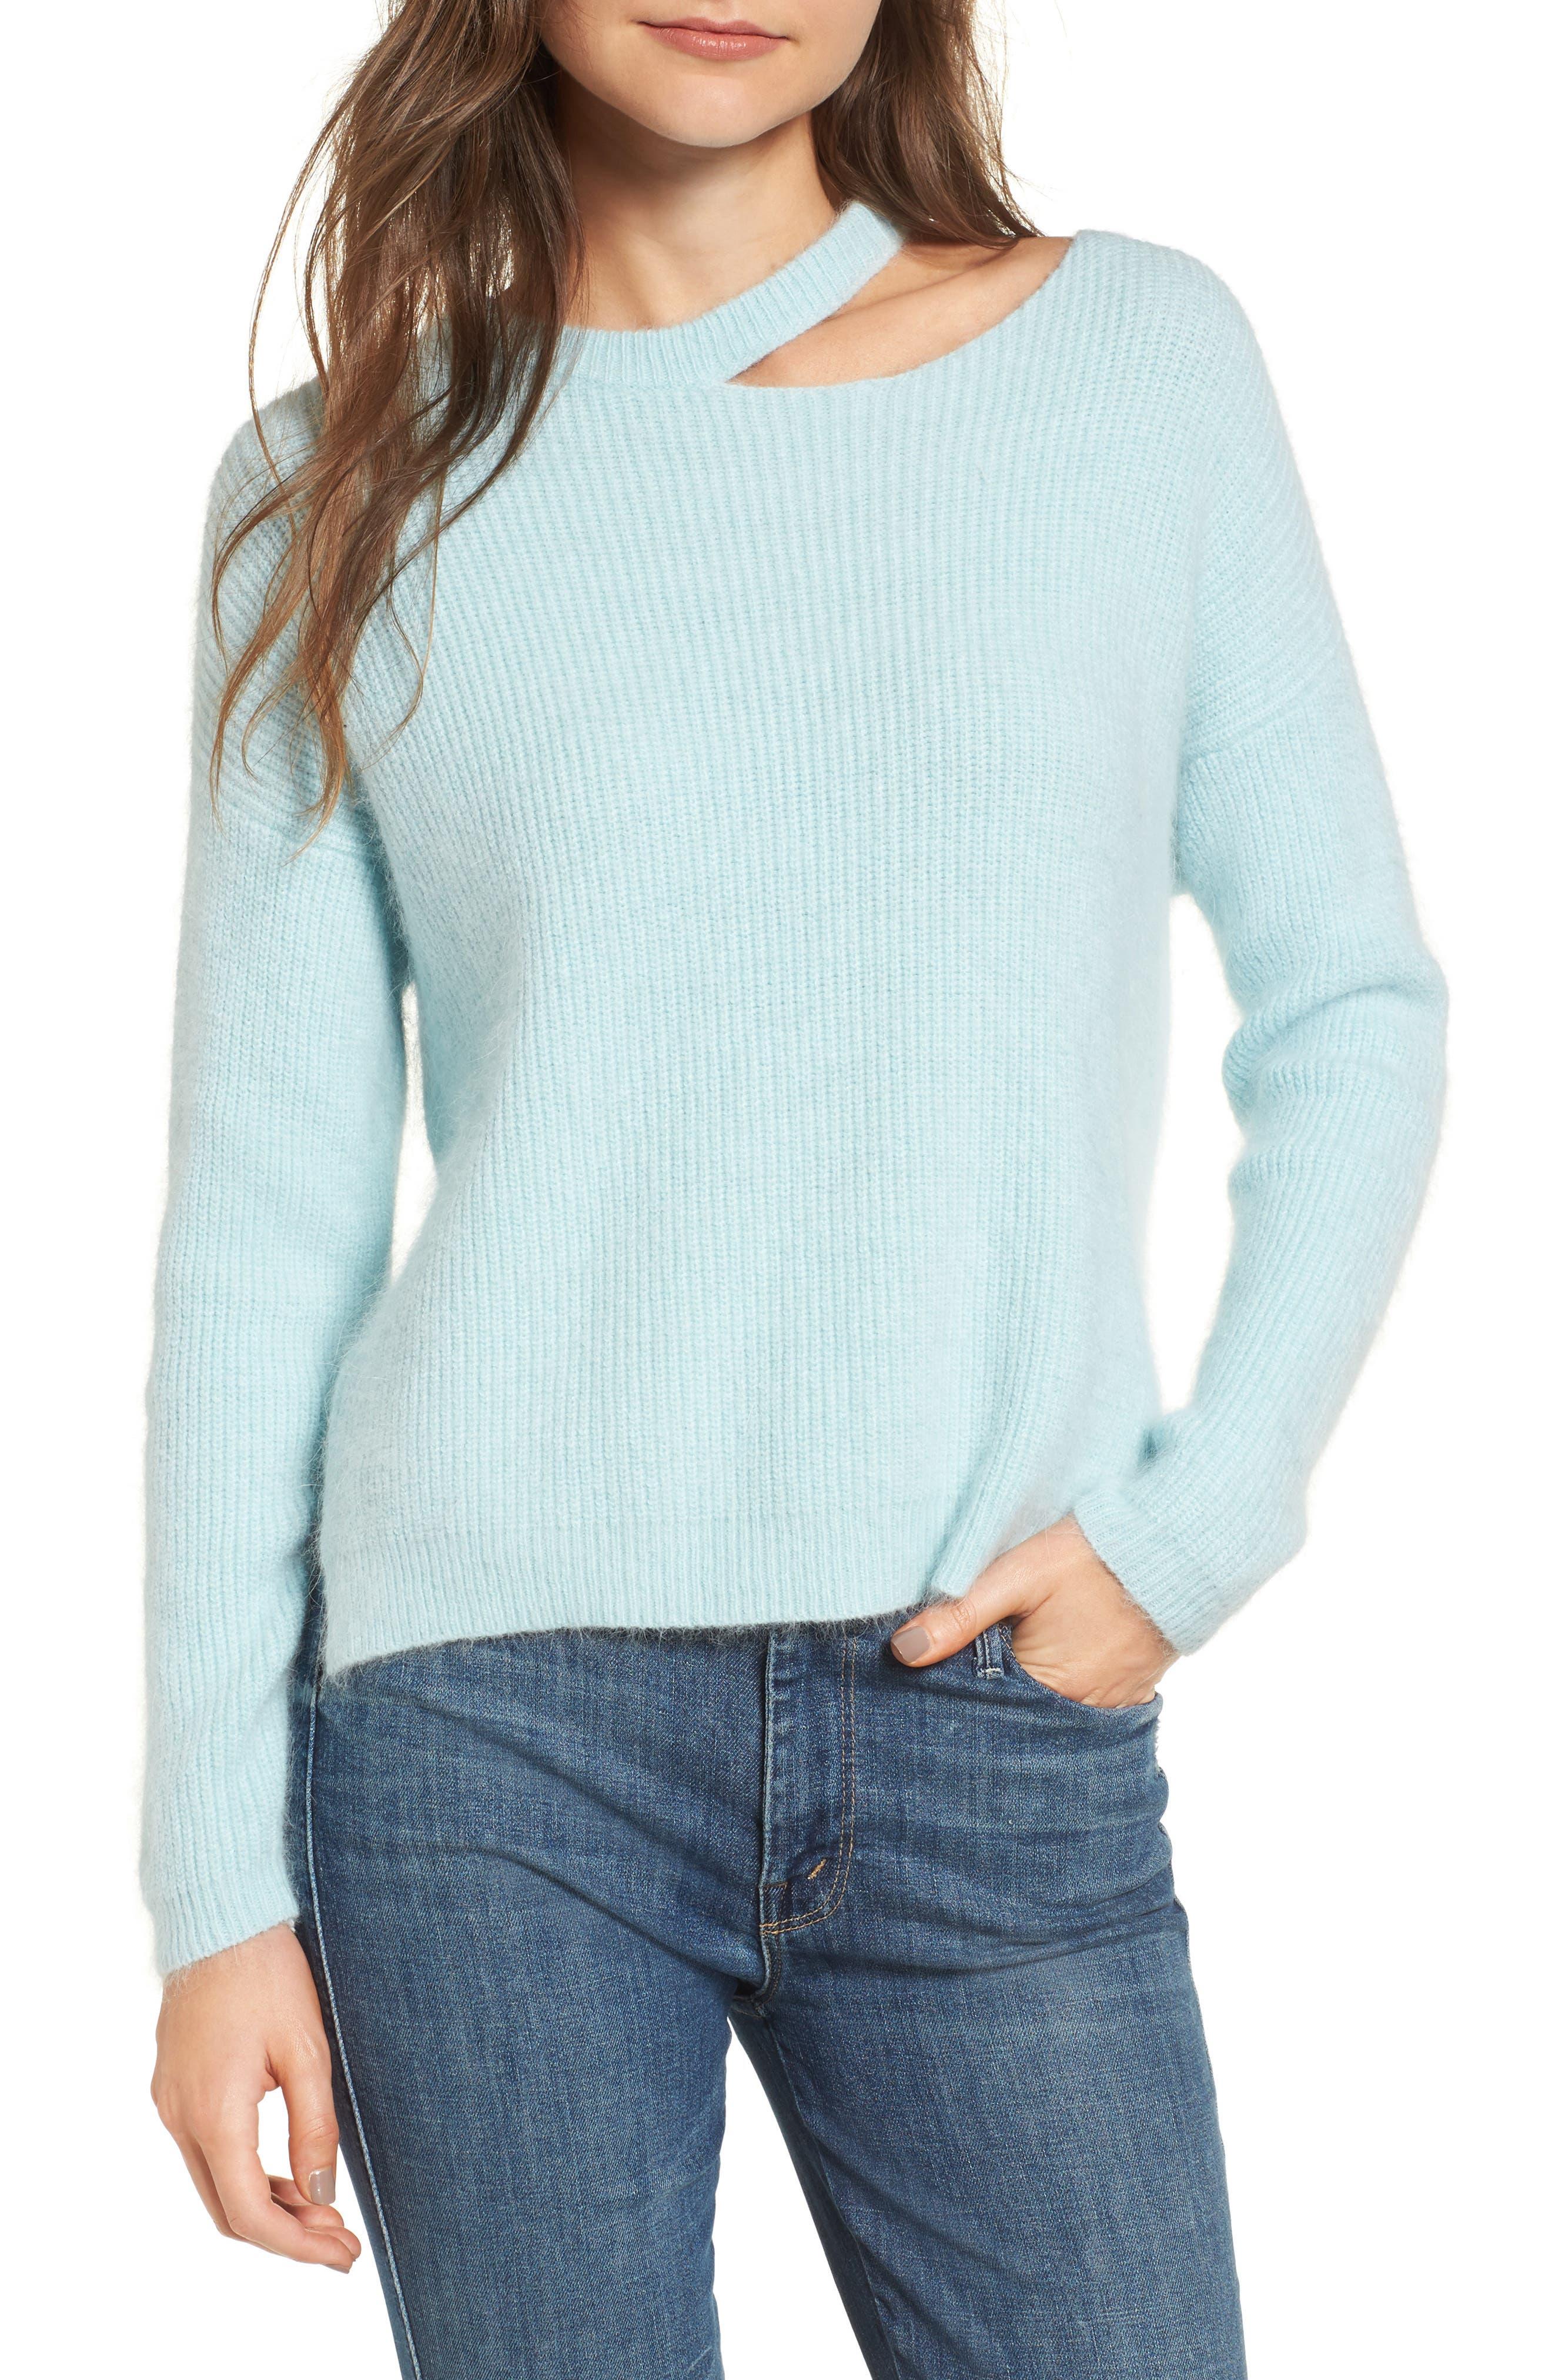 Ovidian Sweater,                         Main,                         color, 460